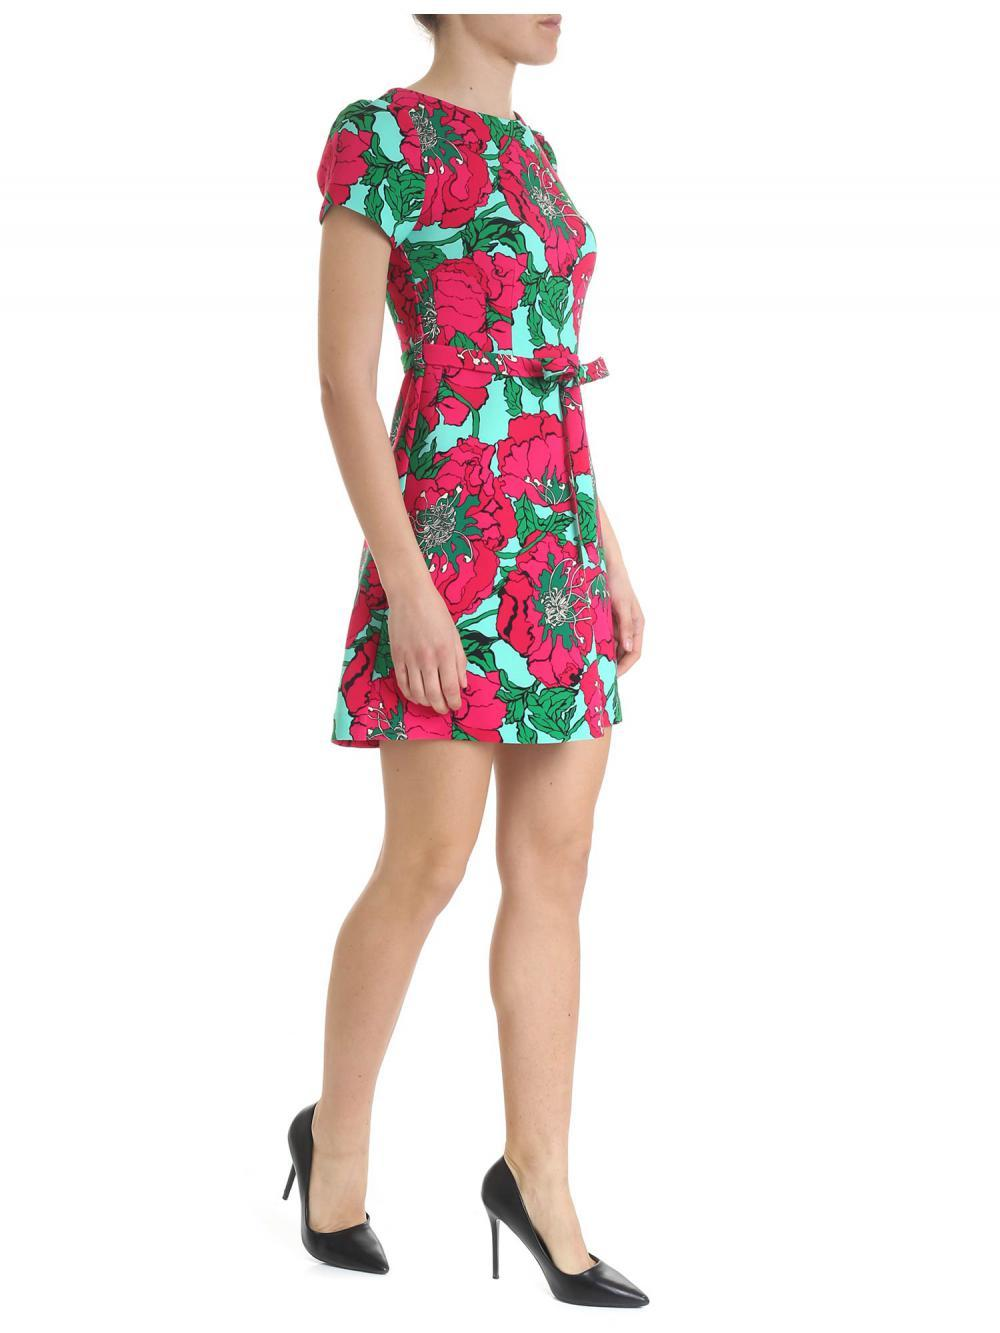 dress-p-a-r-o-s-h-cod-d731055